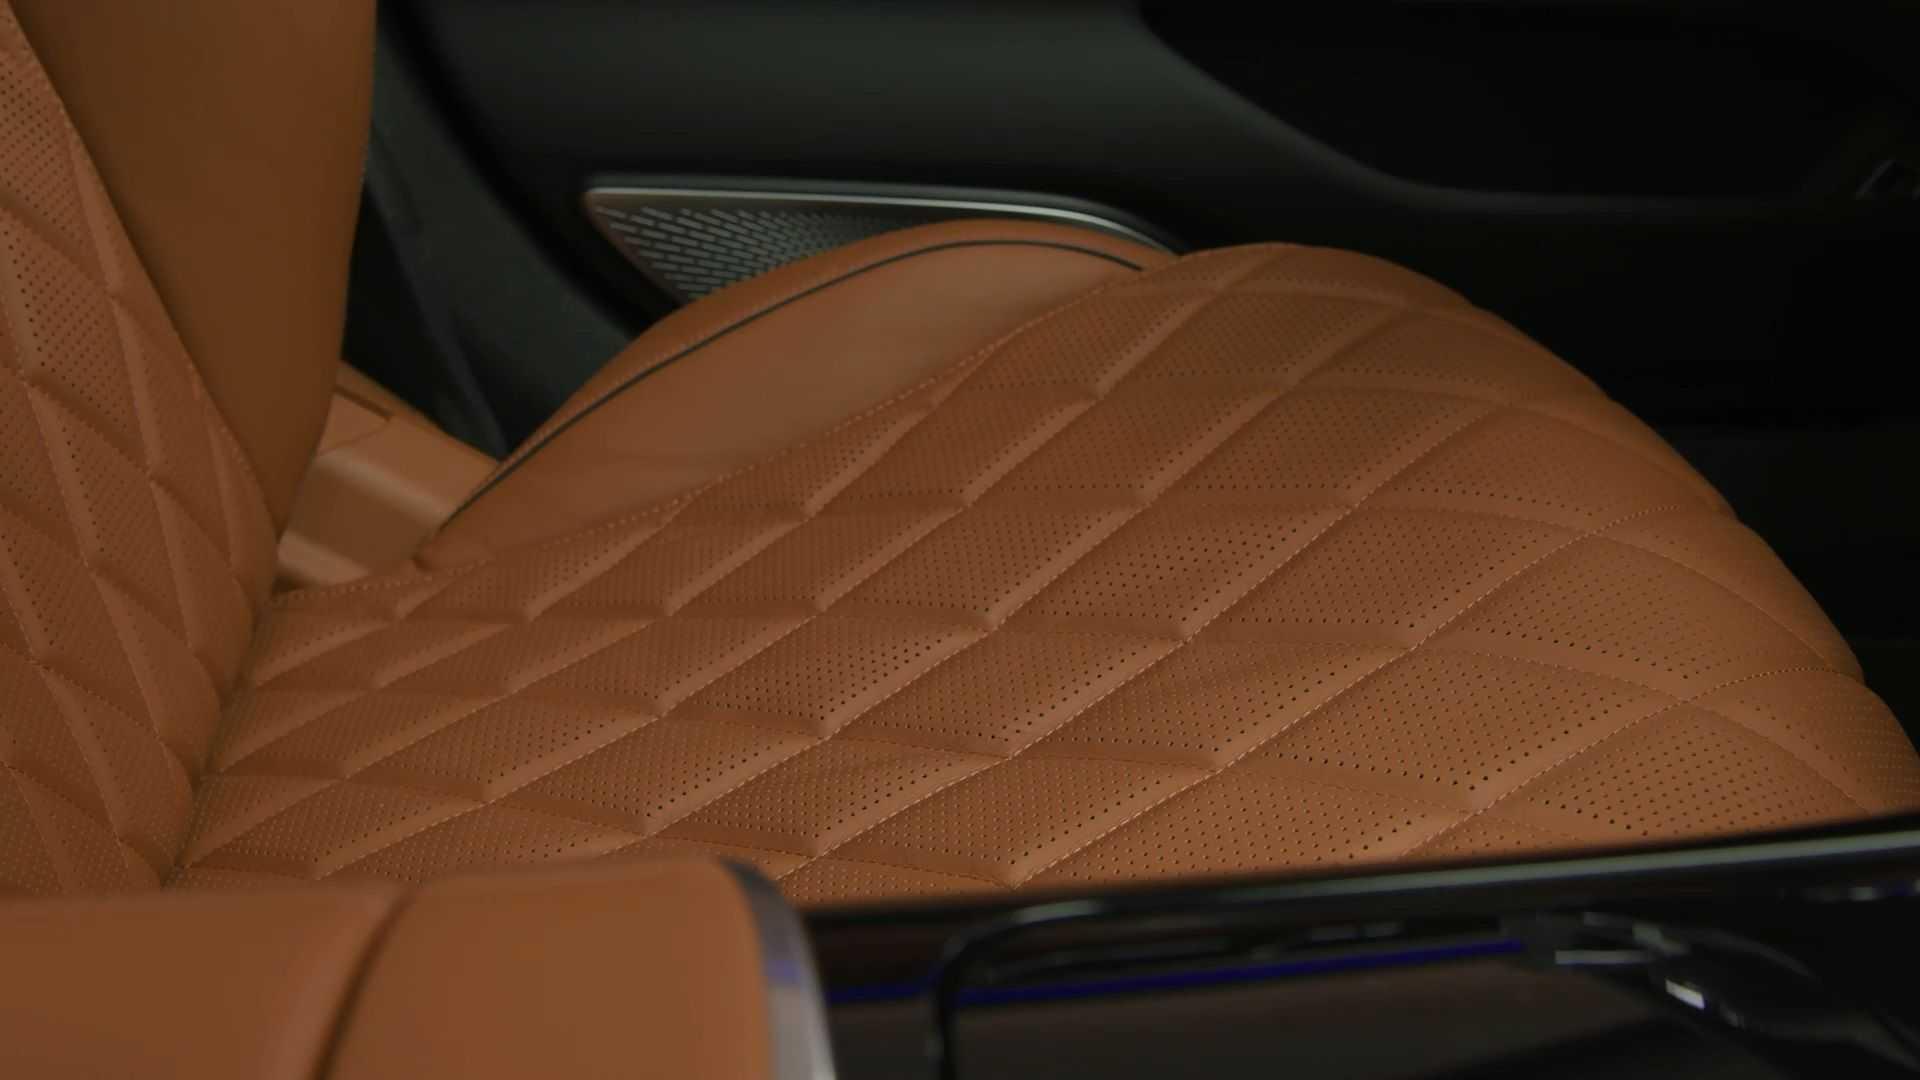 2021-mercedes-s-class-interior-25